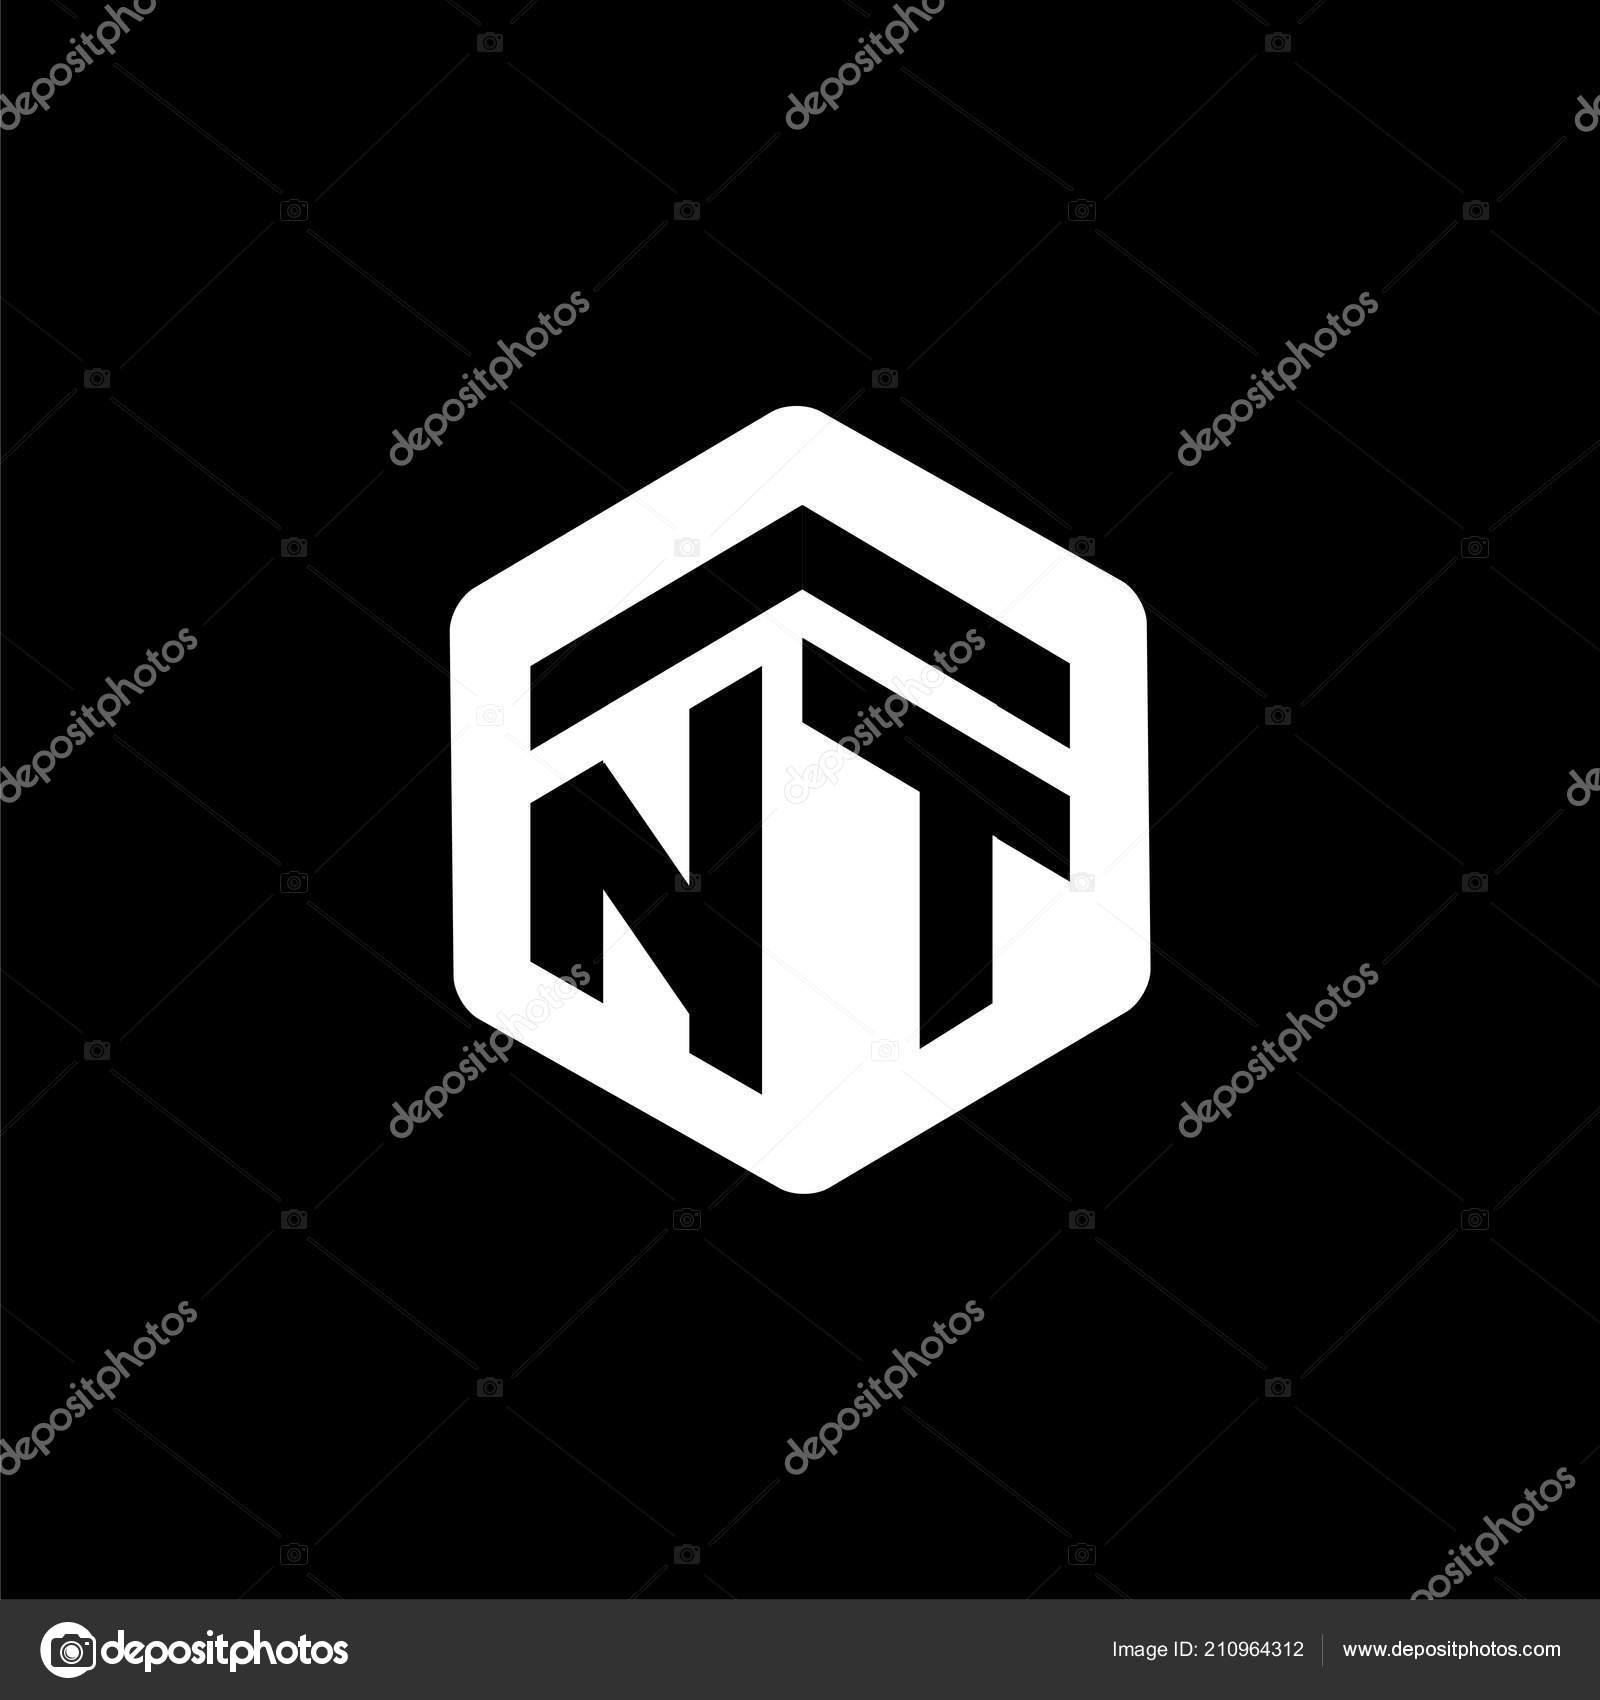 Initial Letter Hexagonal Logo Vector Stock Vector Desbayy 210964312